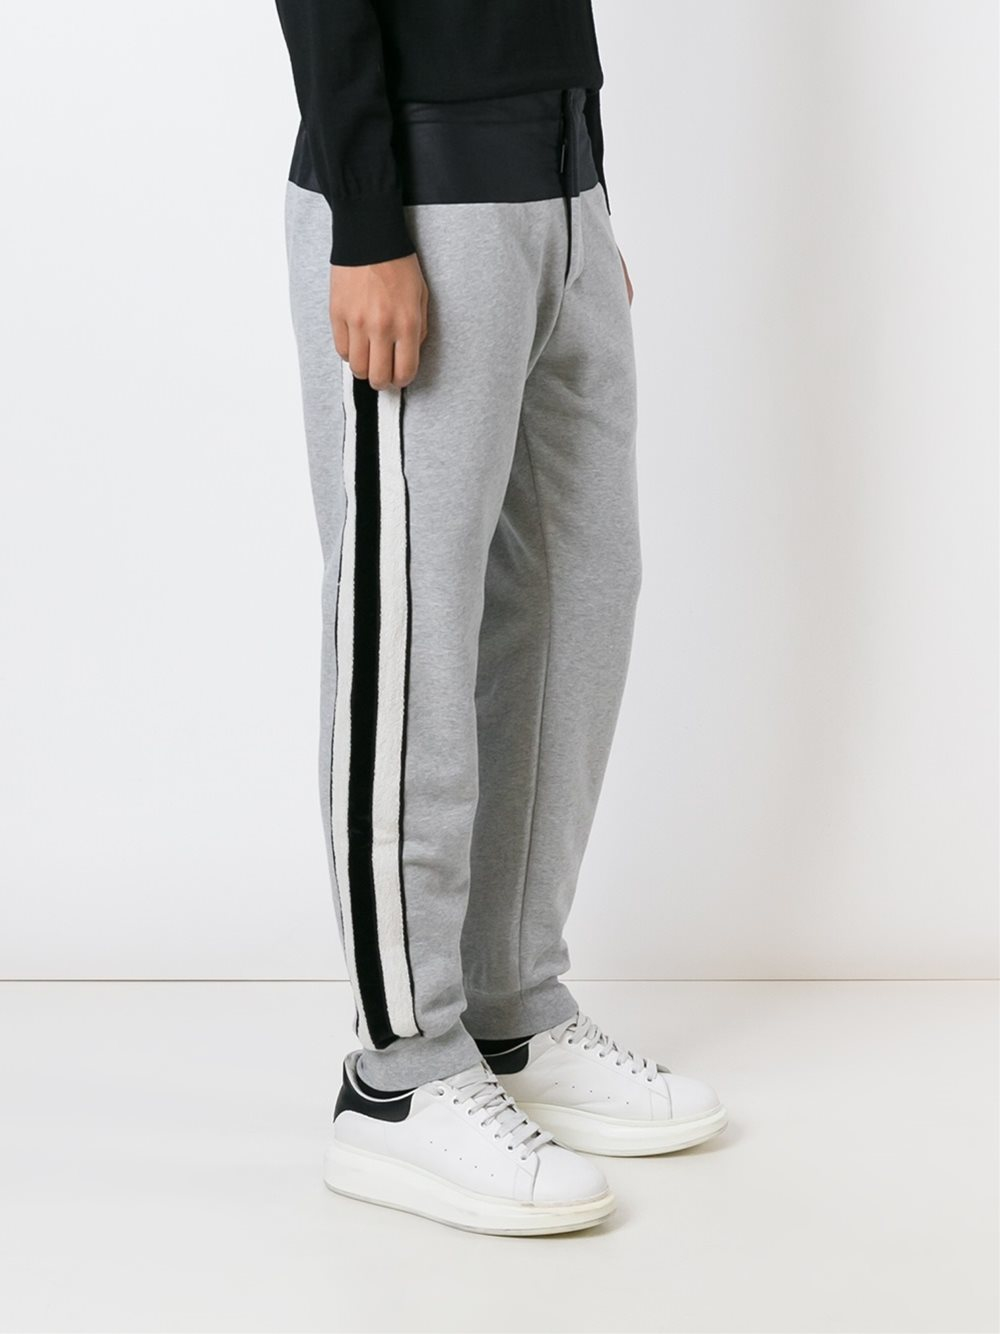 Alexander mcqueen side stripe track pants in gray for men - Hm herren jeans ...